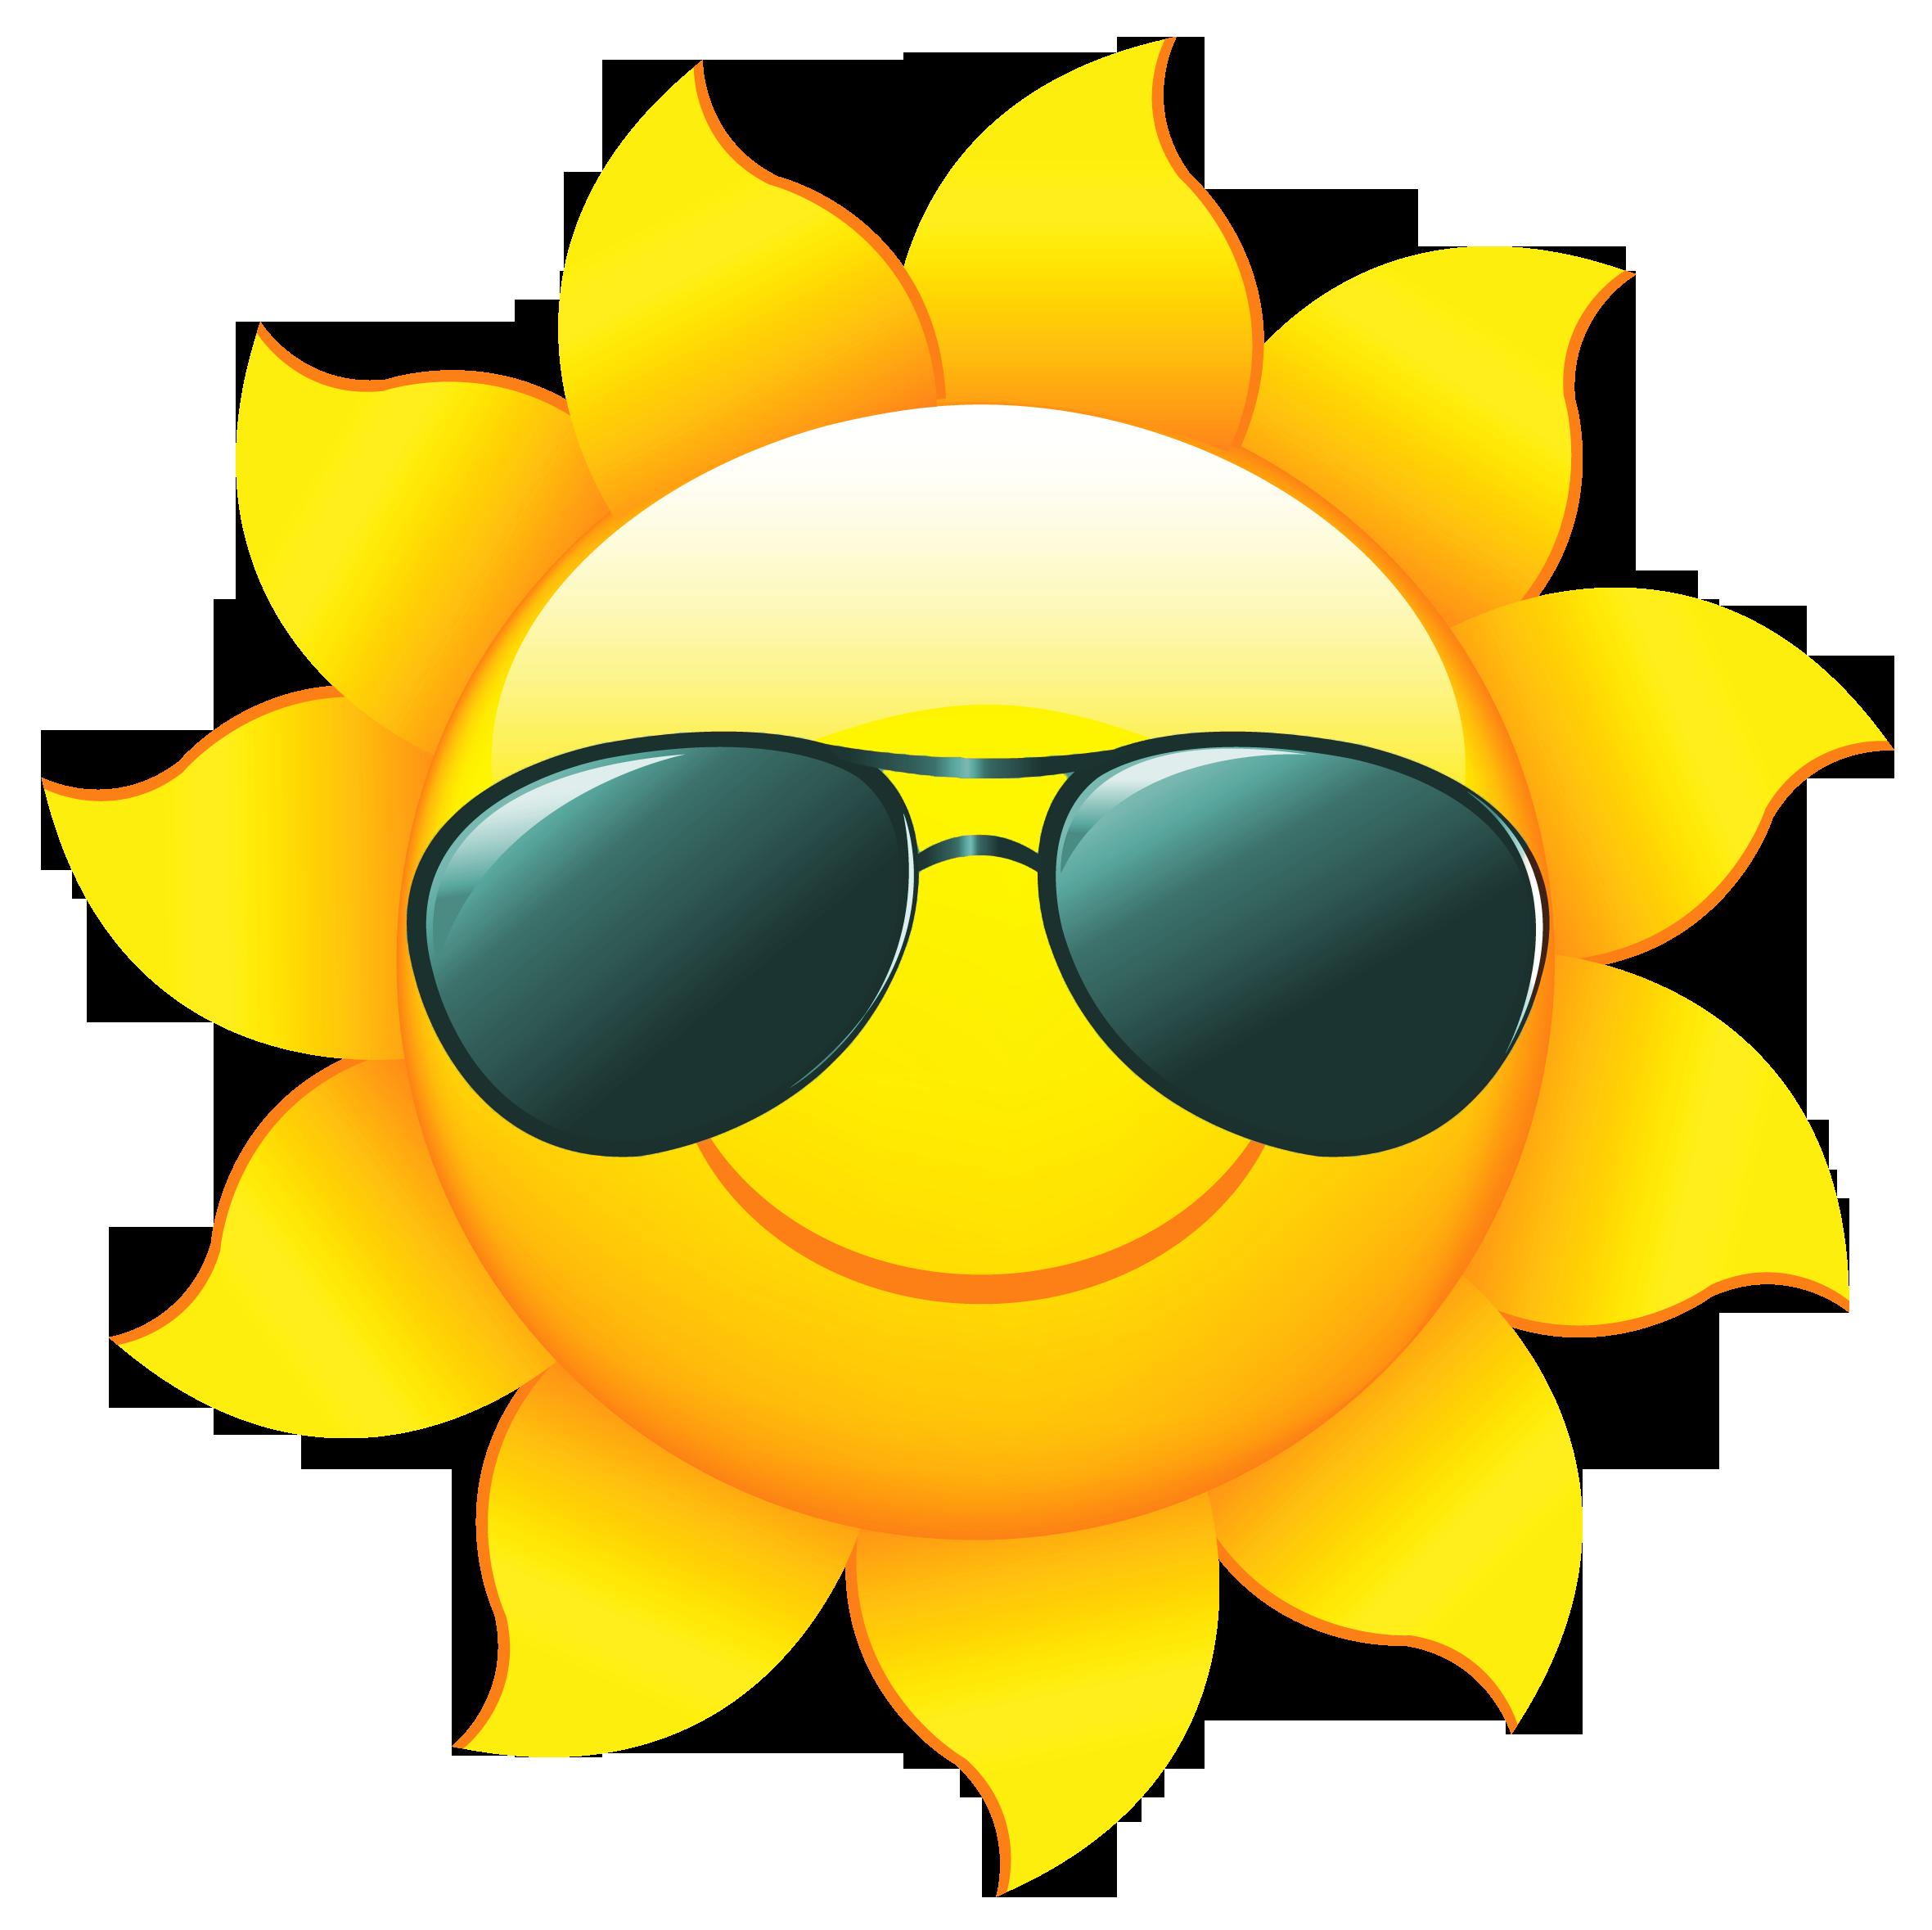 2361x2358 Awesome Idea Sunshine Clipart Free Sun Clip Art To Brighten Your